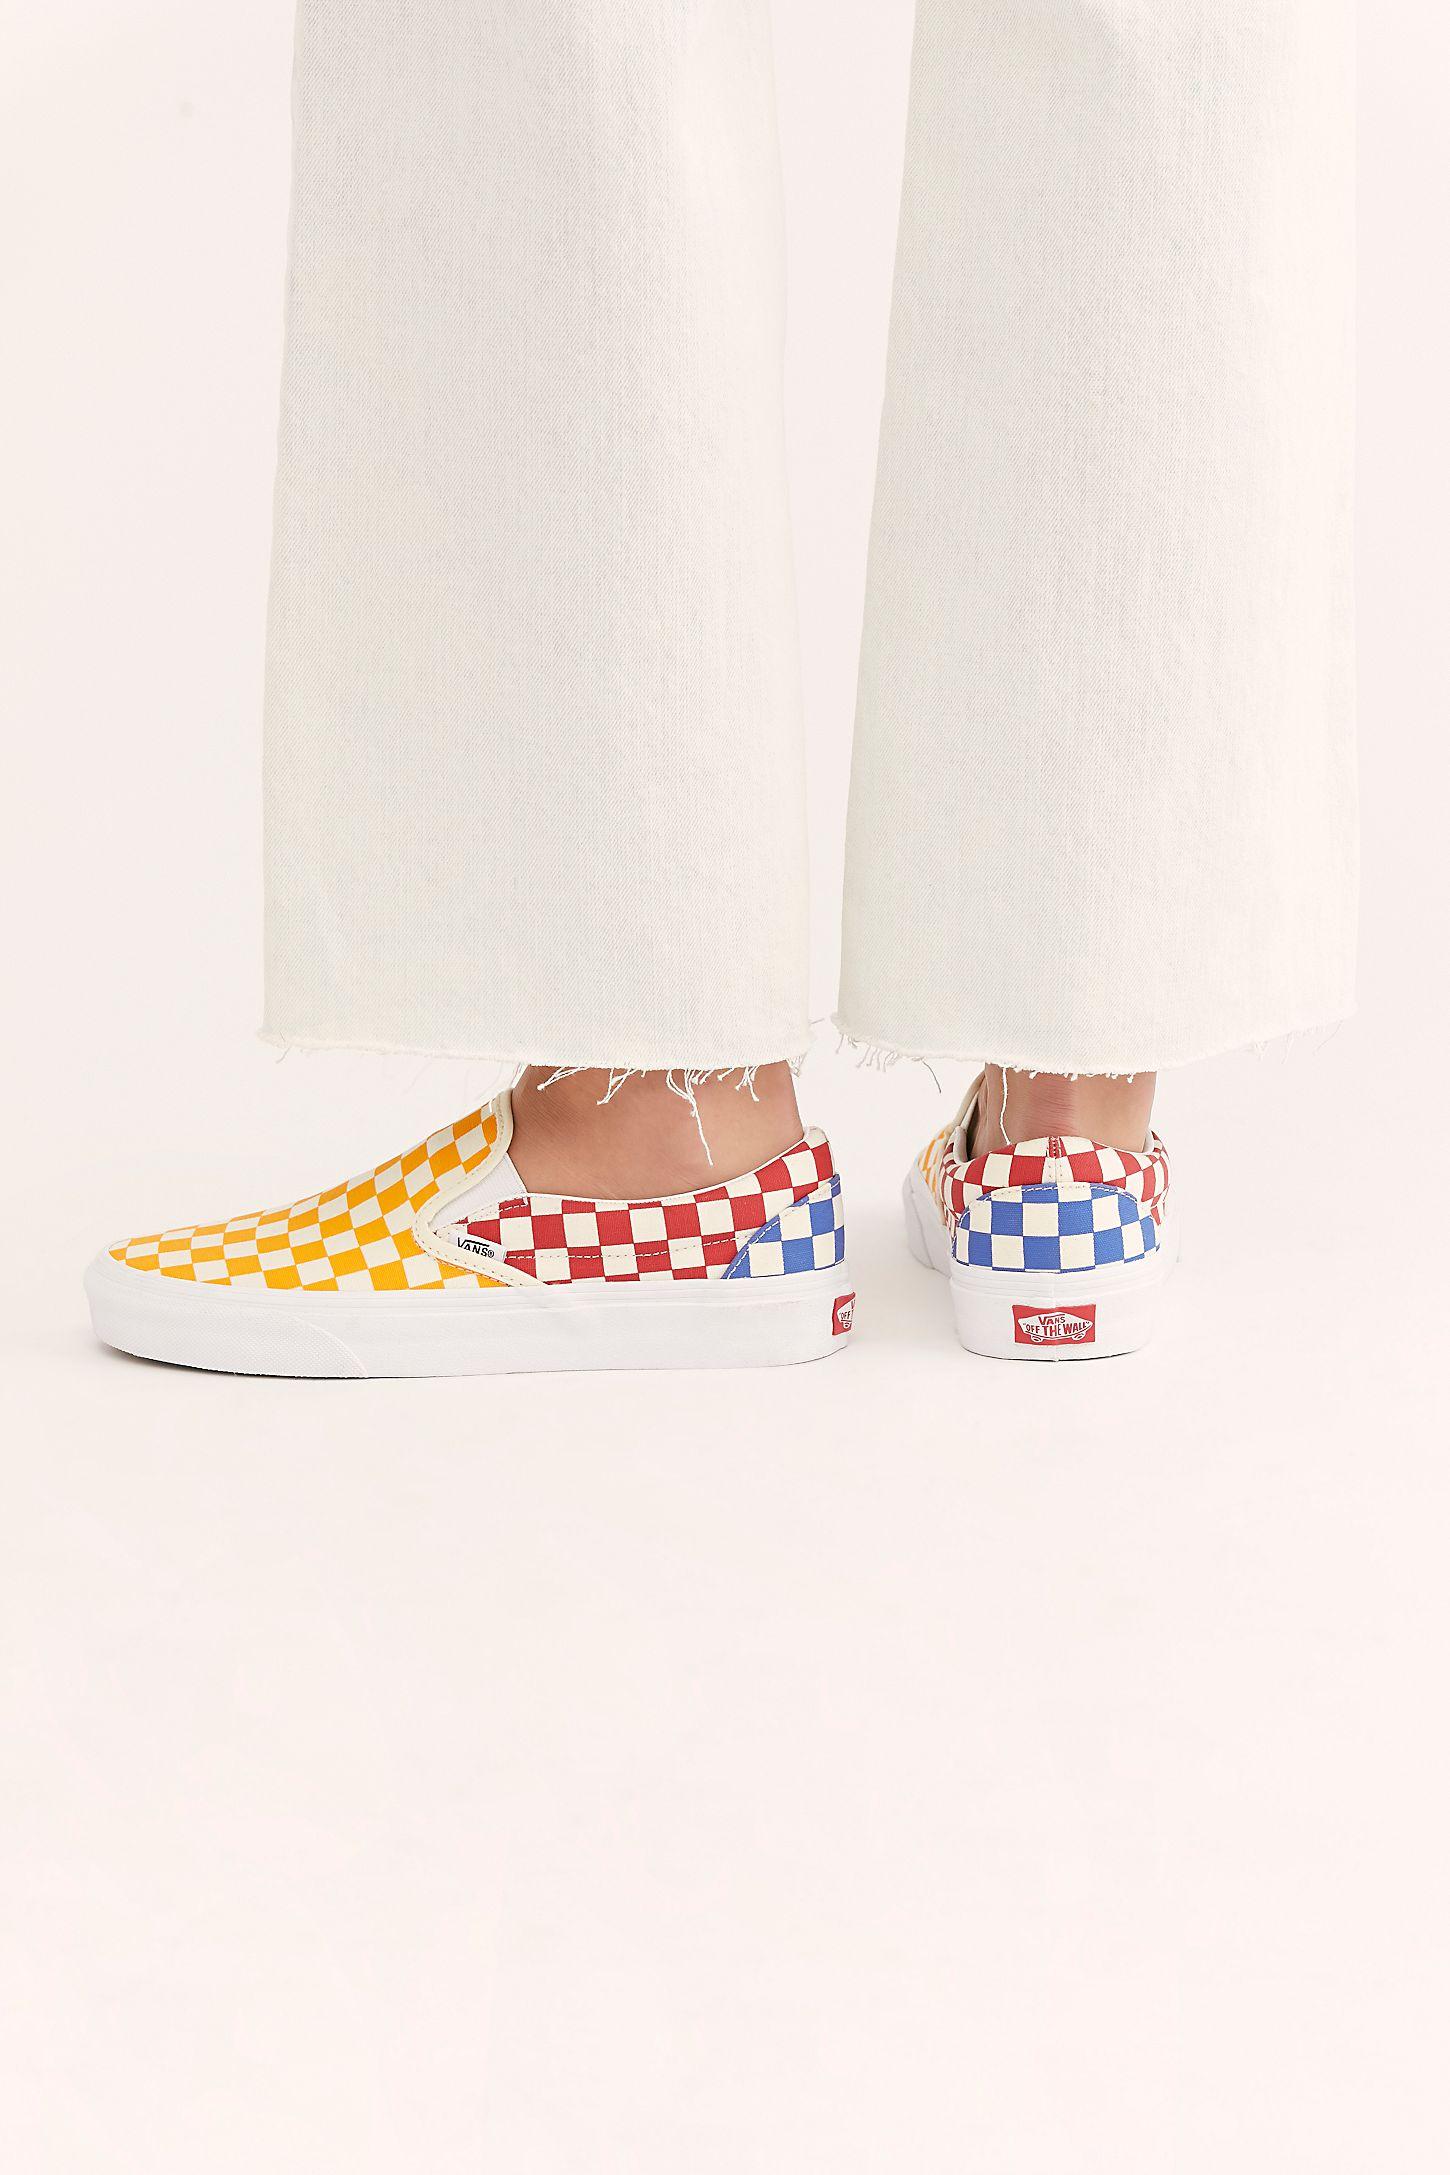 online retailer d7b13 265a3 Slide View 4  Classic Checkered Slip-On